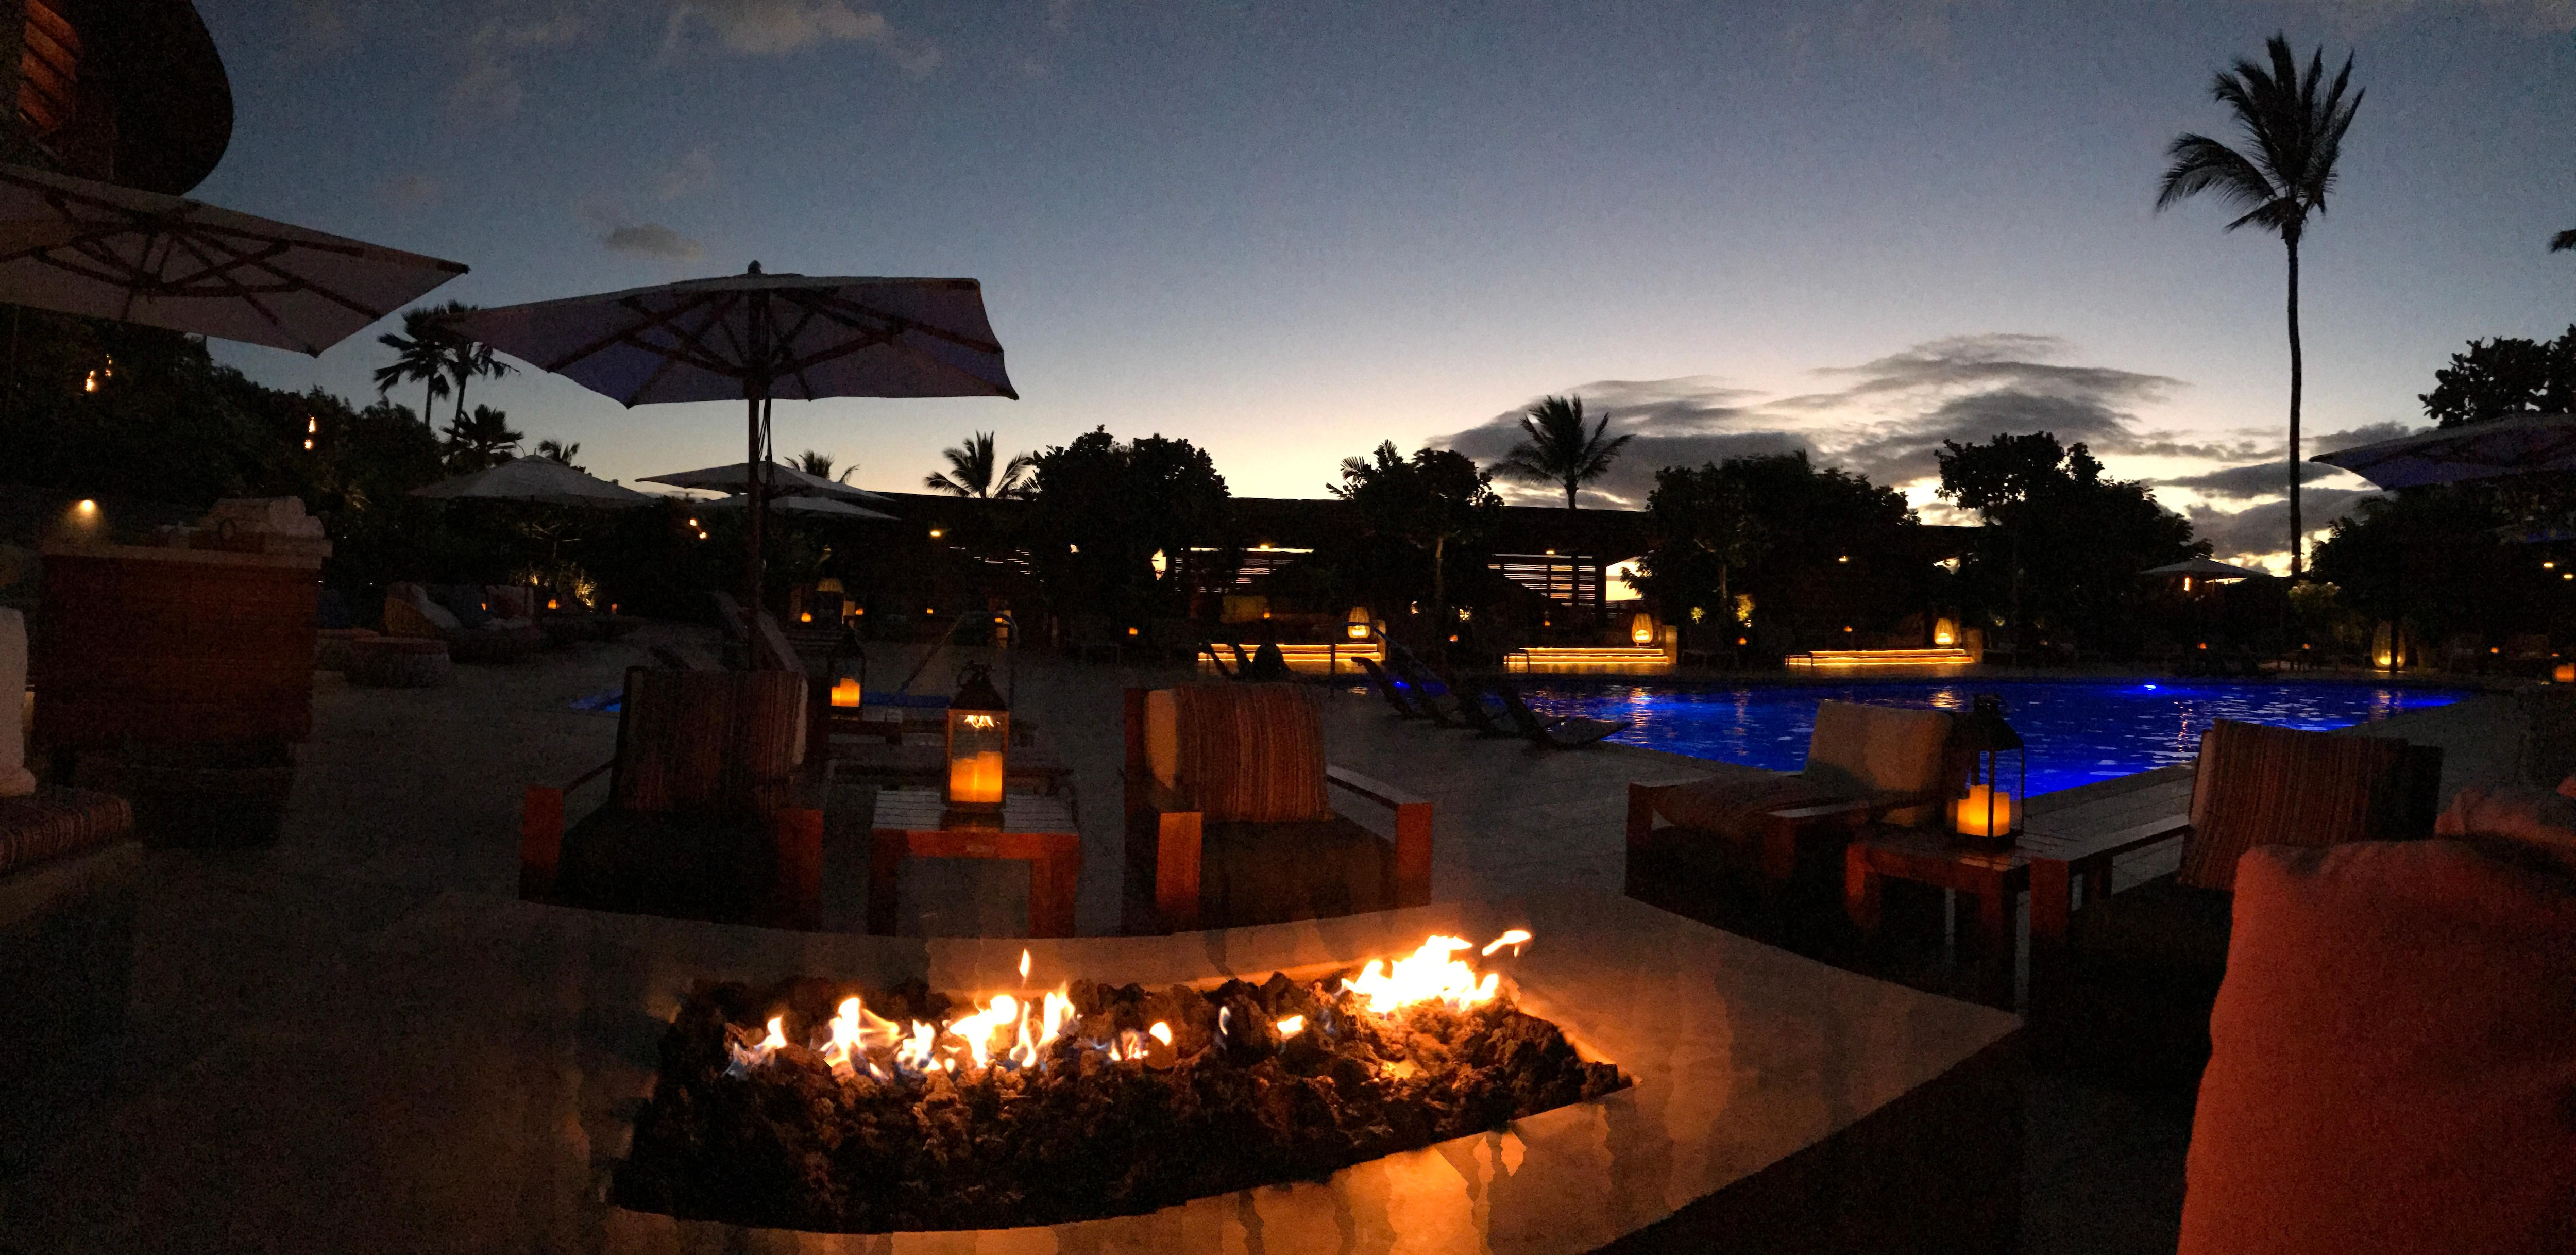 Pool at sunset.